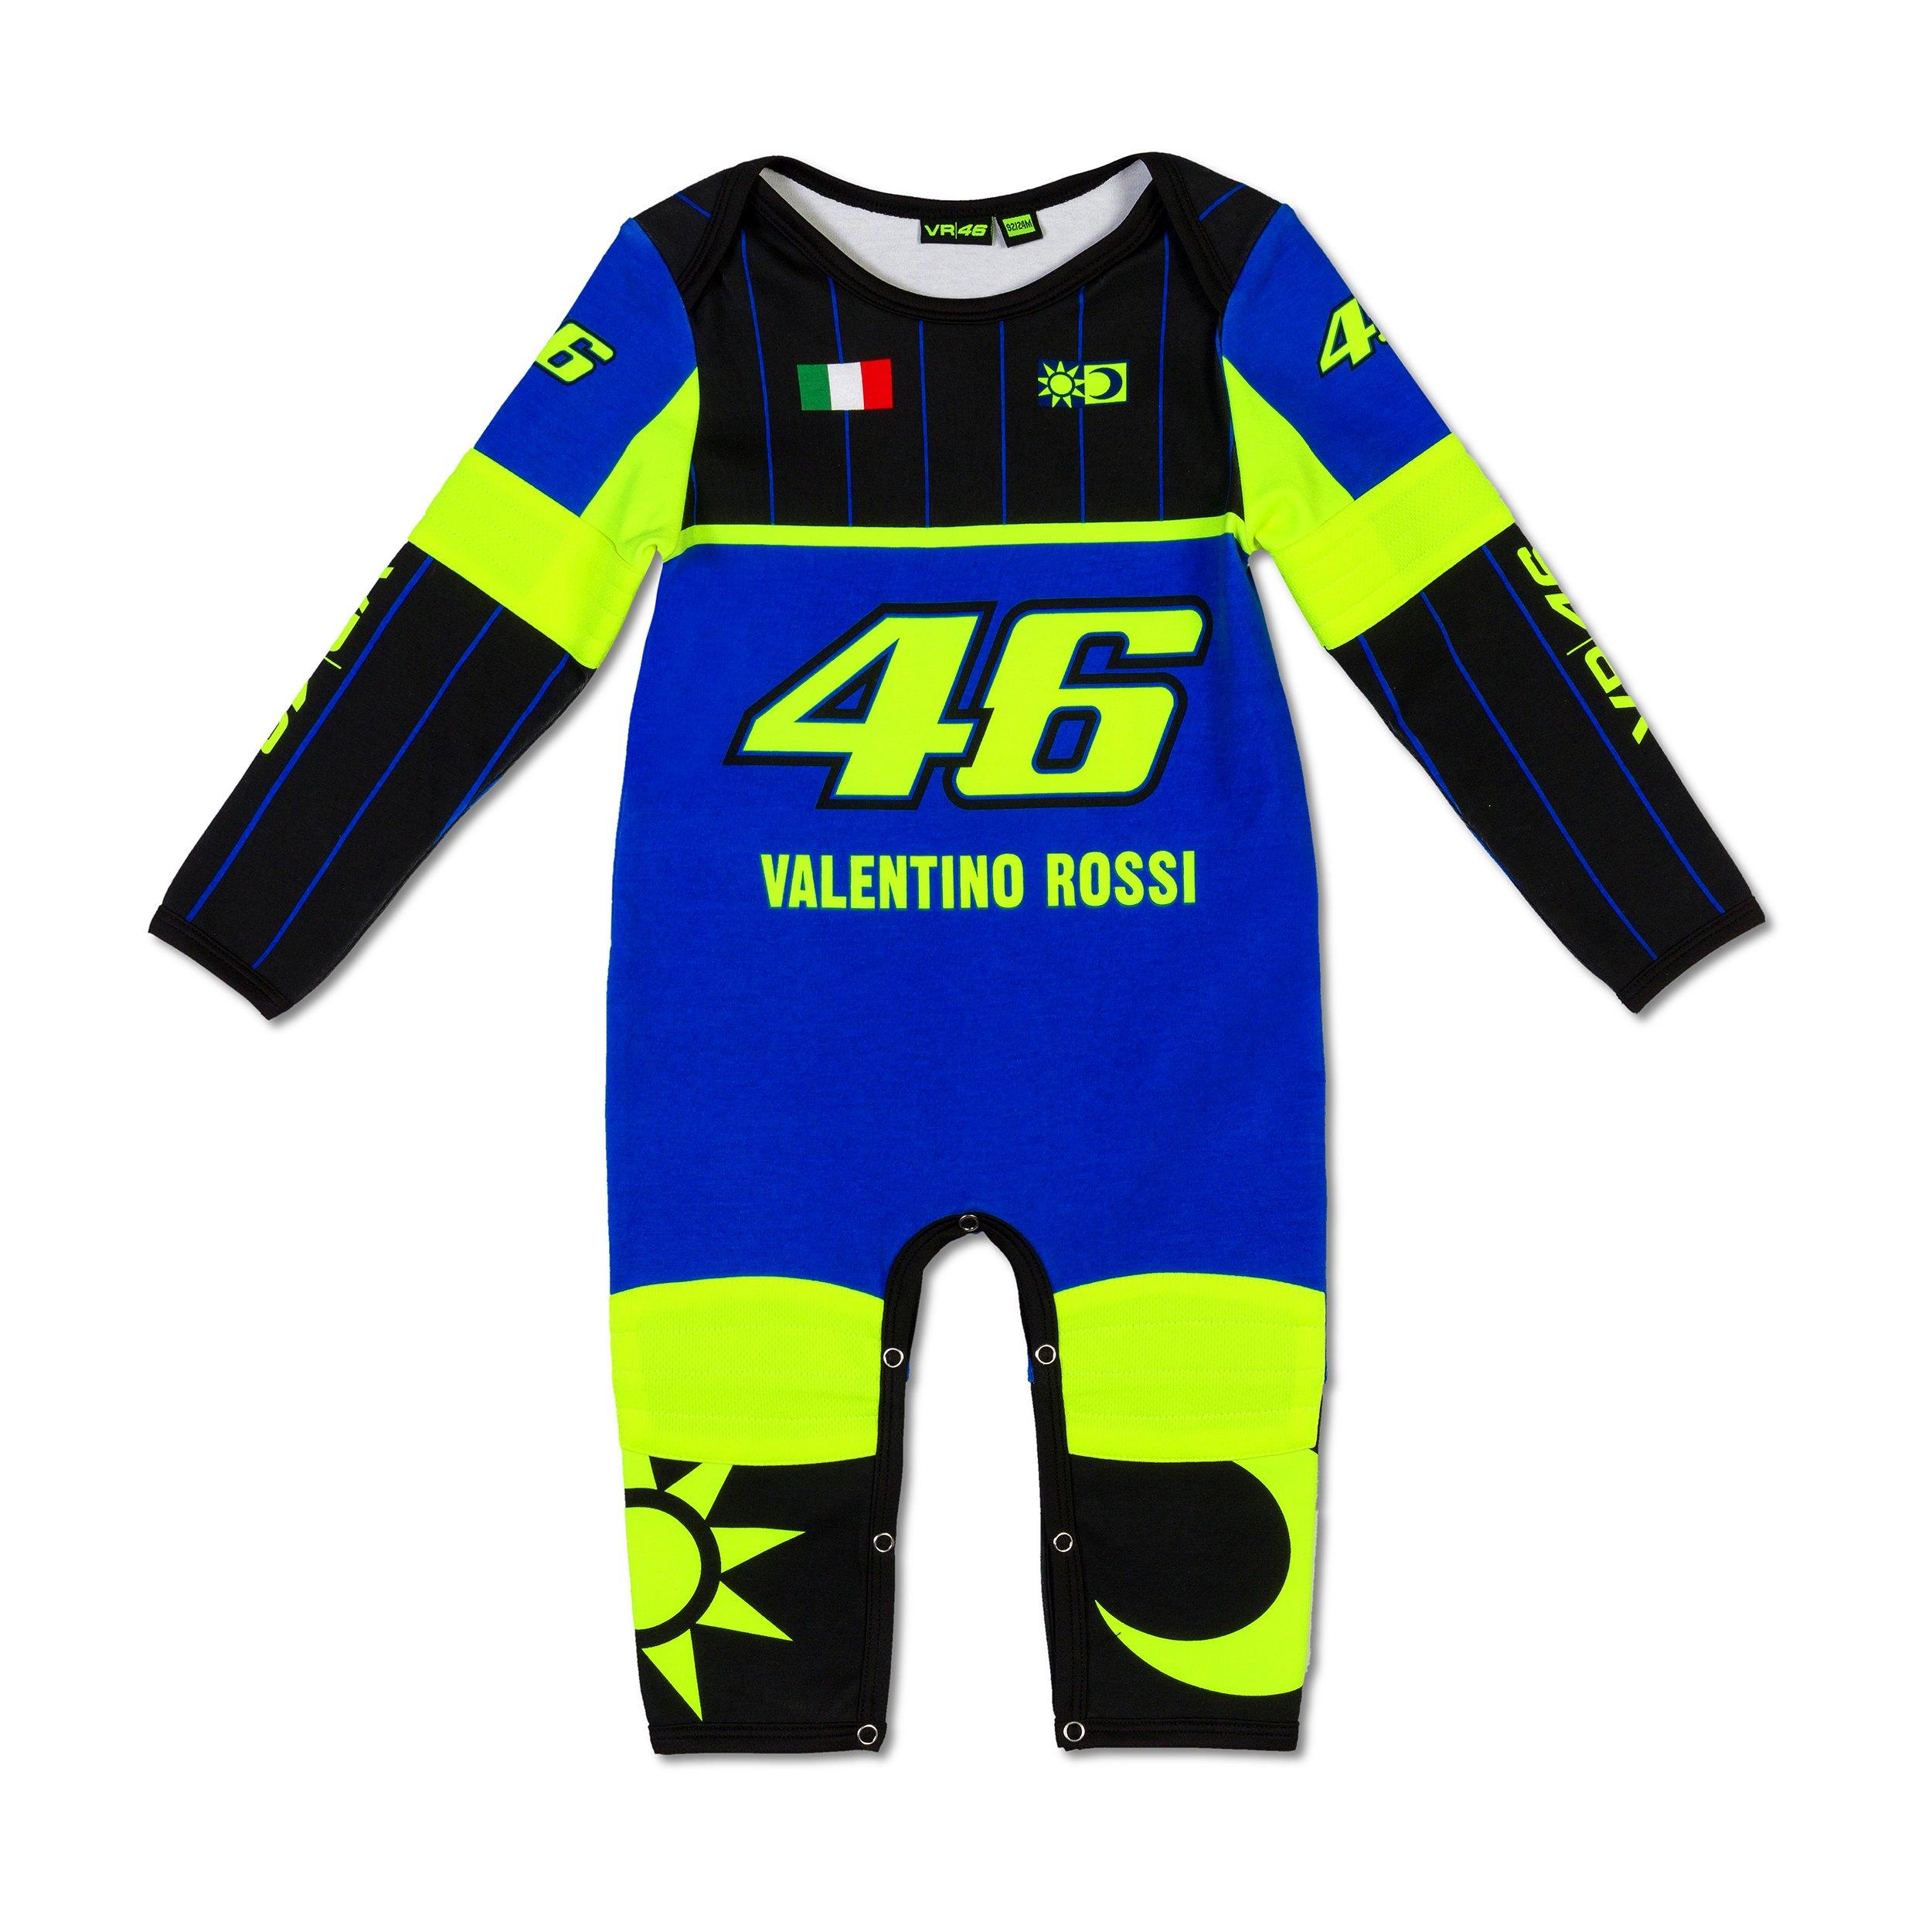 VR46 Baby Overall Turtle 46 VR|46 Valentino Rossi 12 Monate